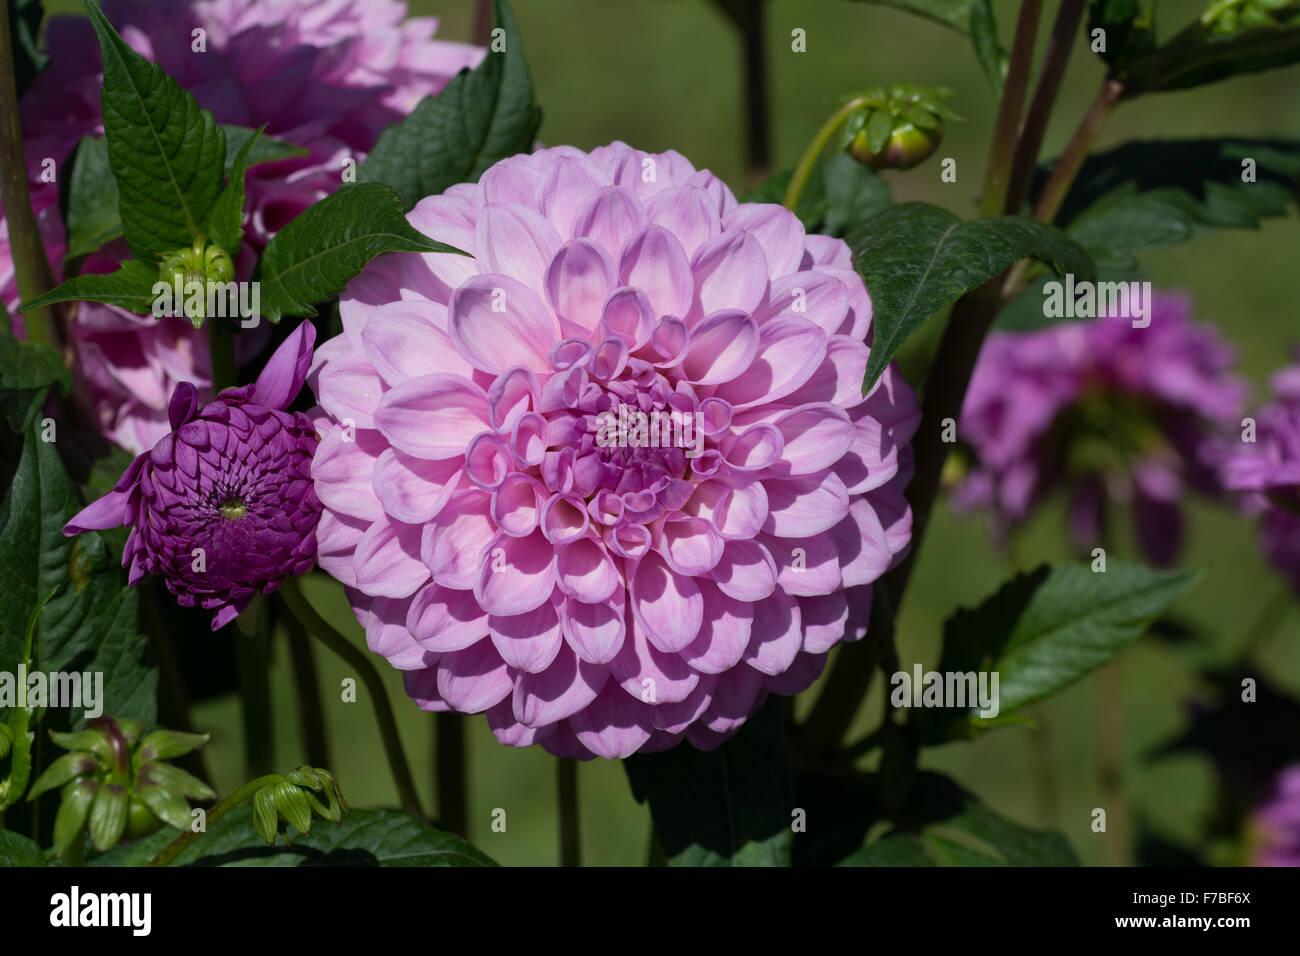 Dahlia Barbarry Drifter flower - Stock Image